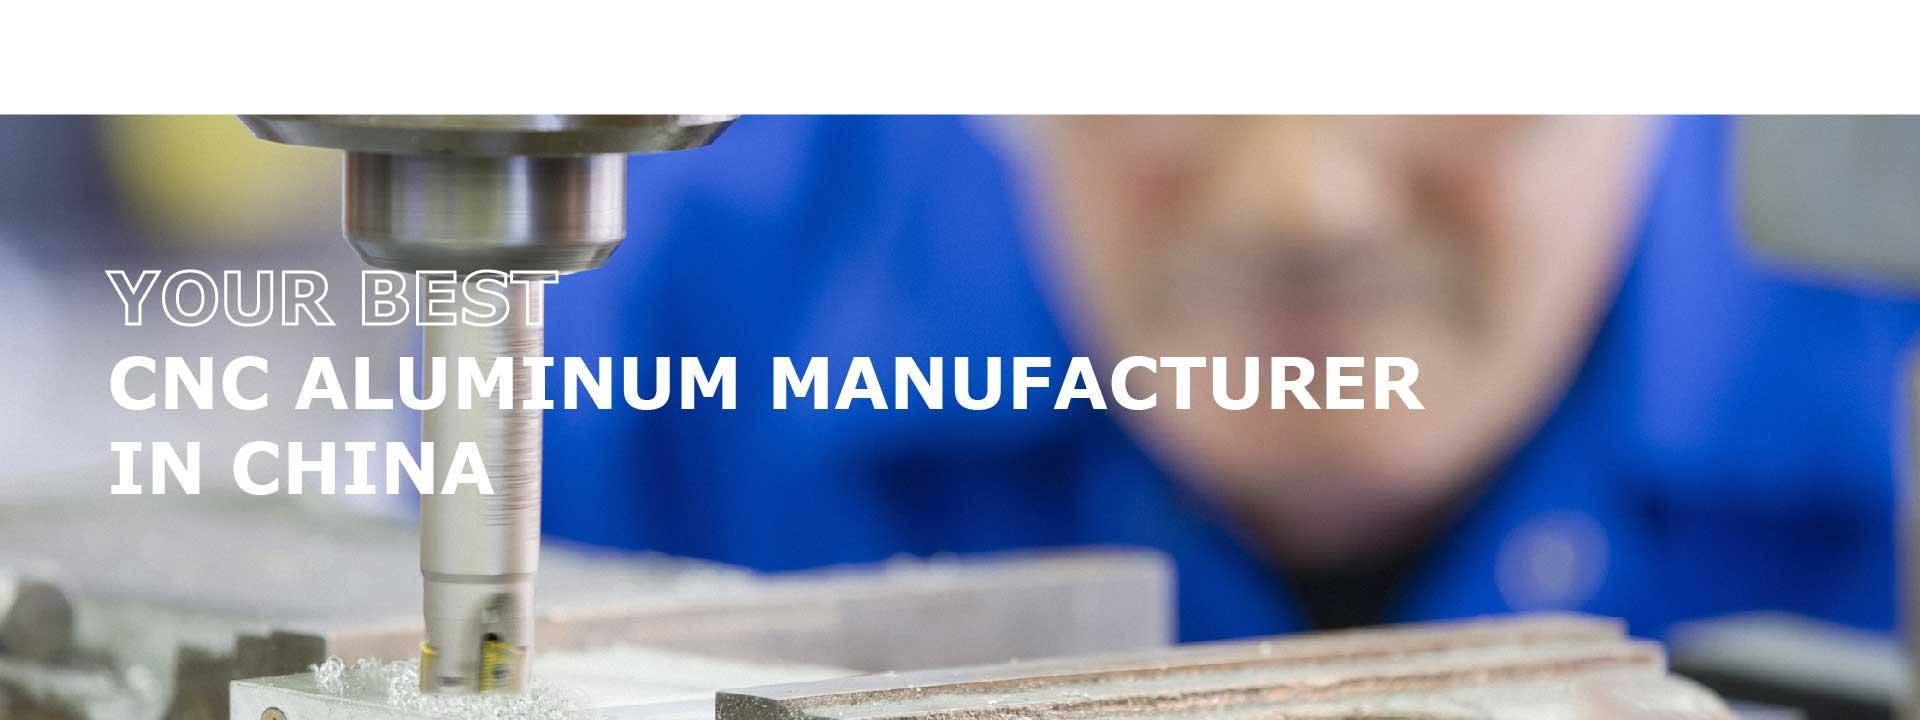 CNC-Aluminum-banner